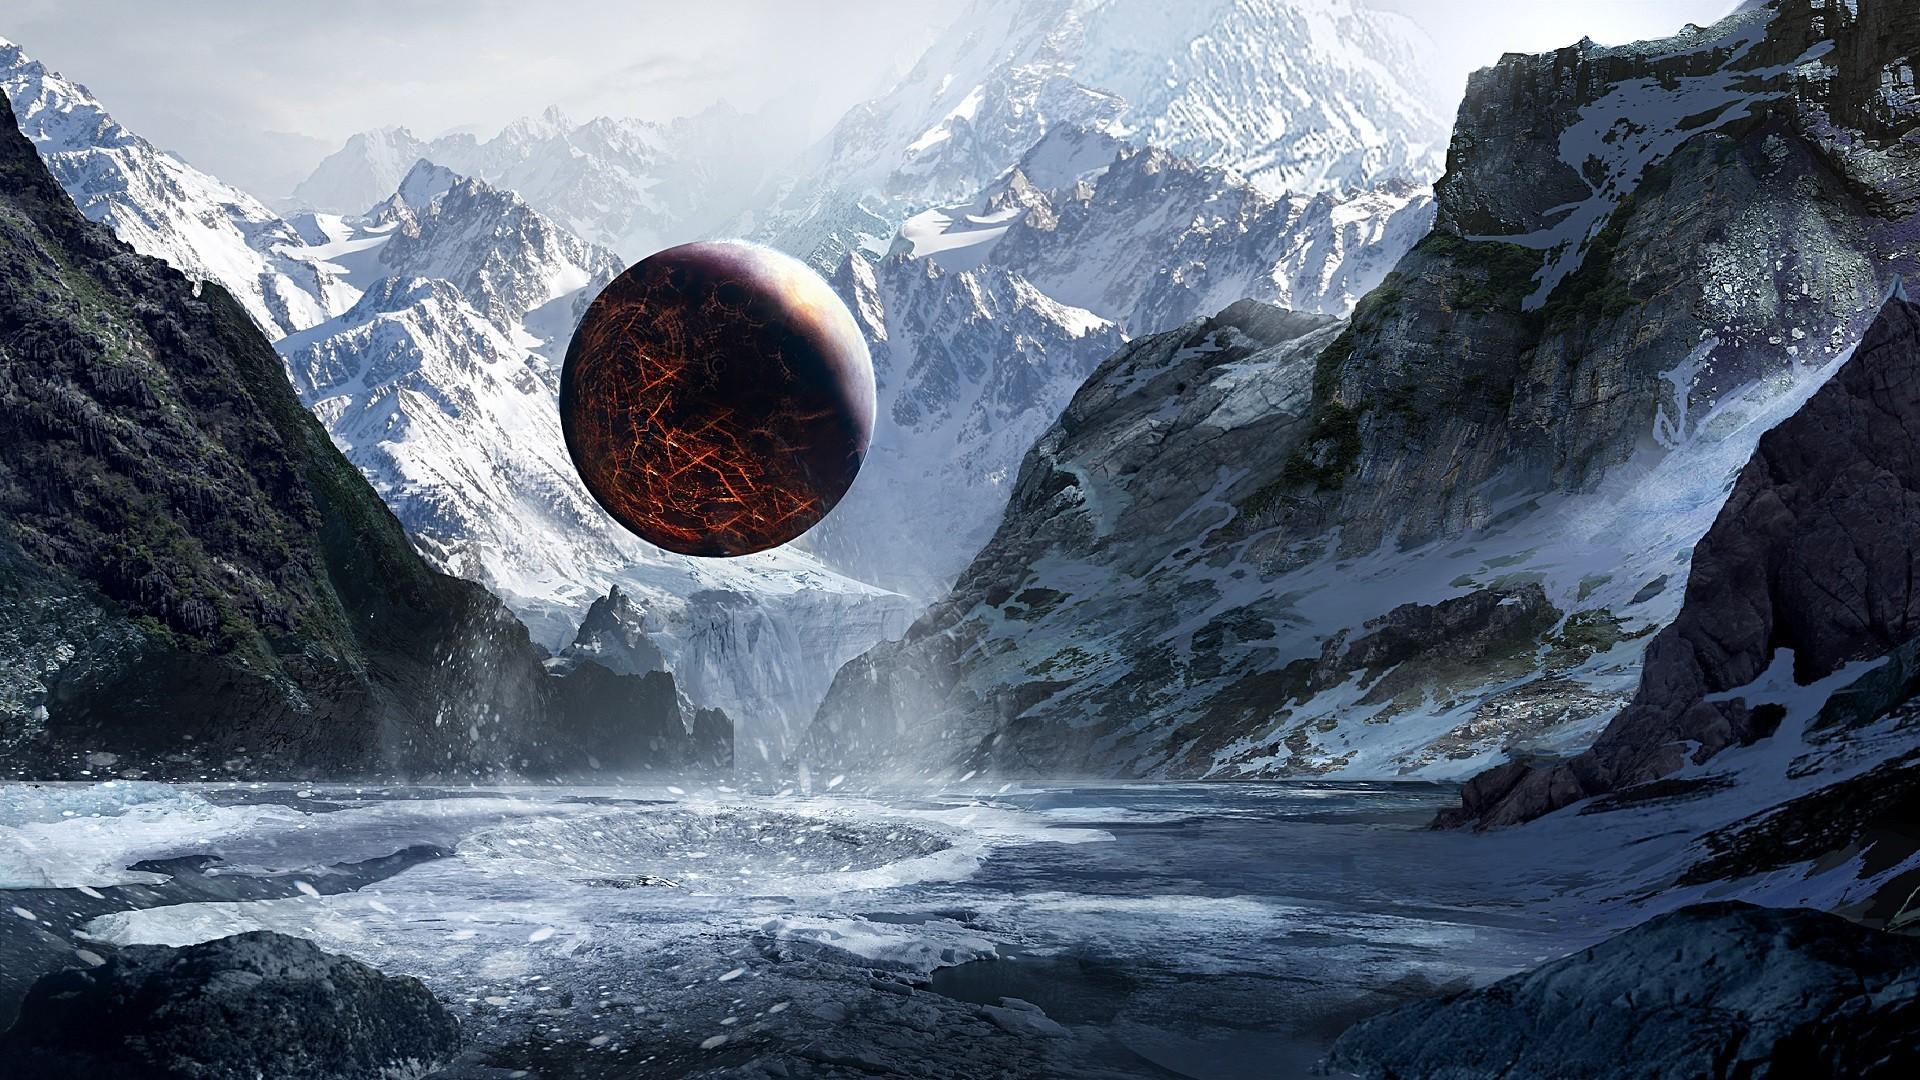 Wallpaper 1920x1080 Px Ice Mountain Planet Sphere